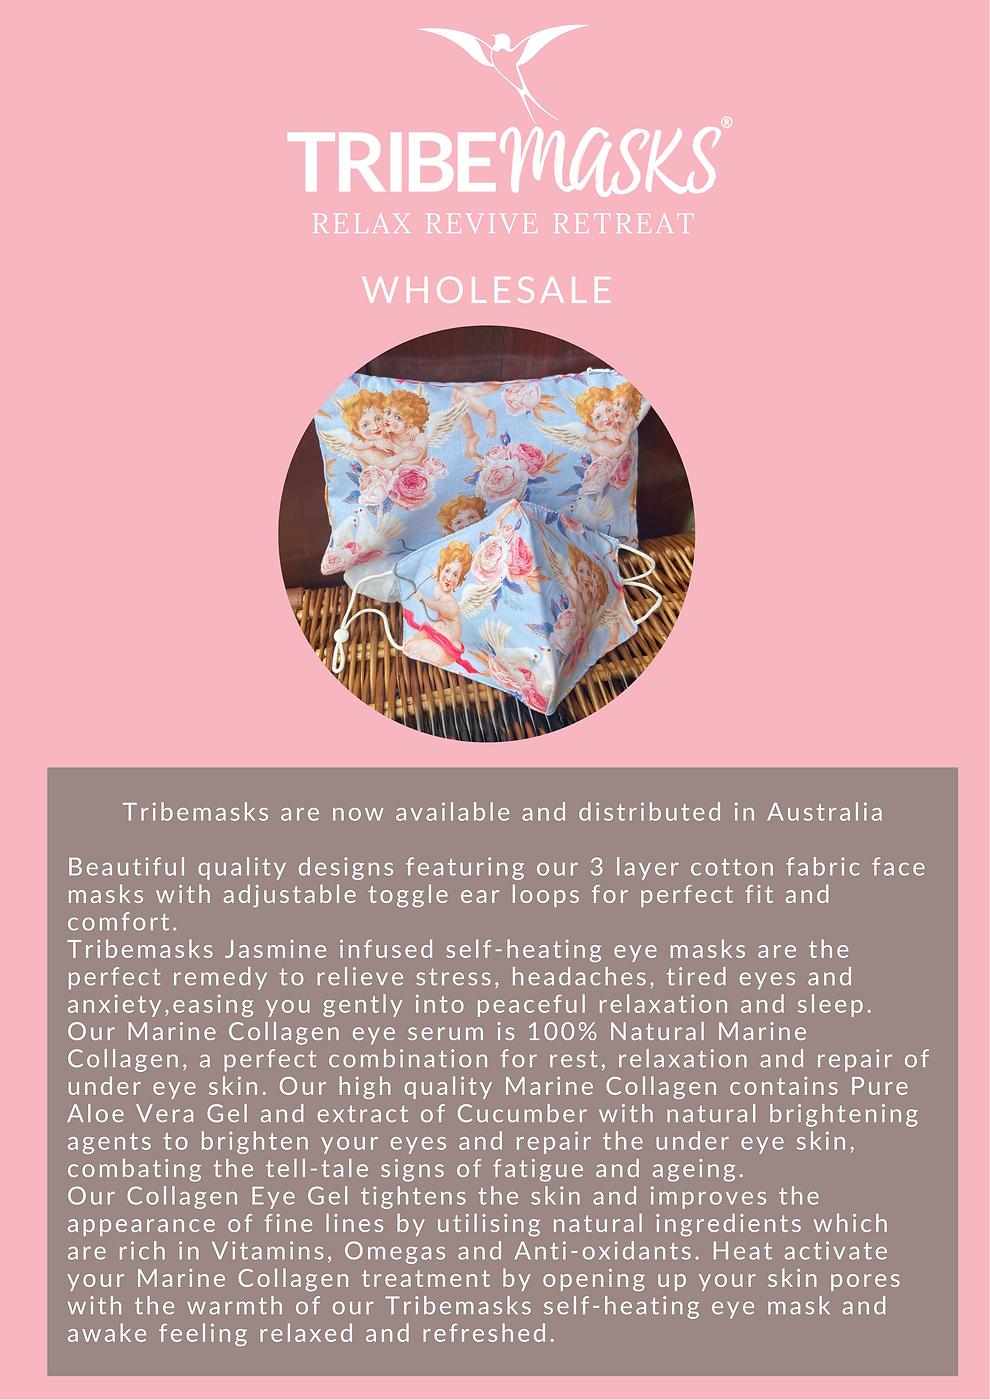 Tribemasks wholesale